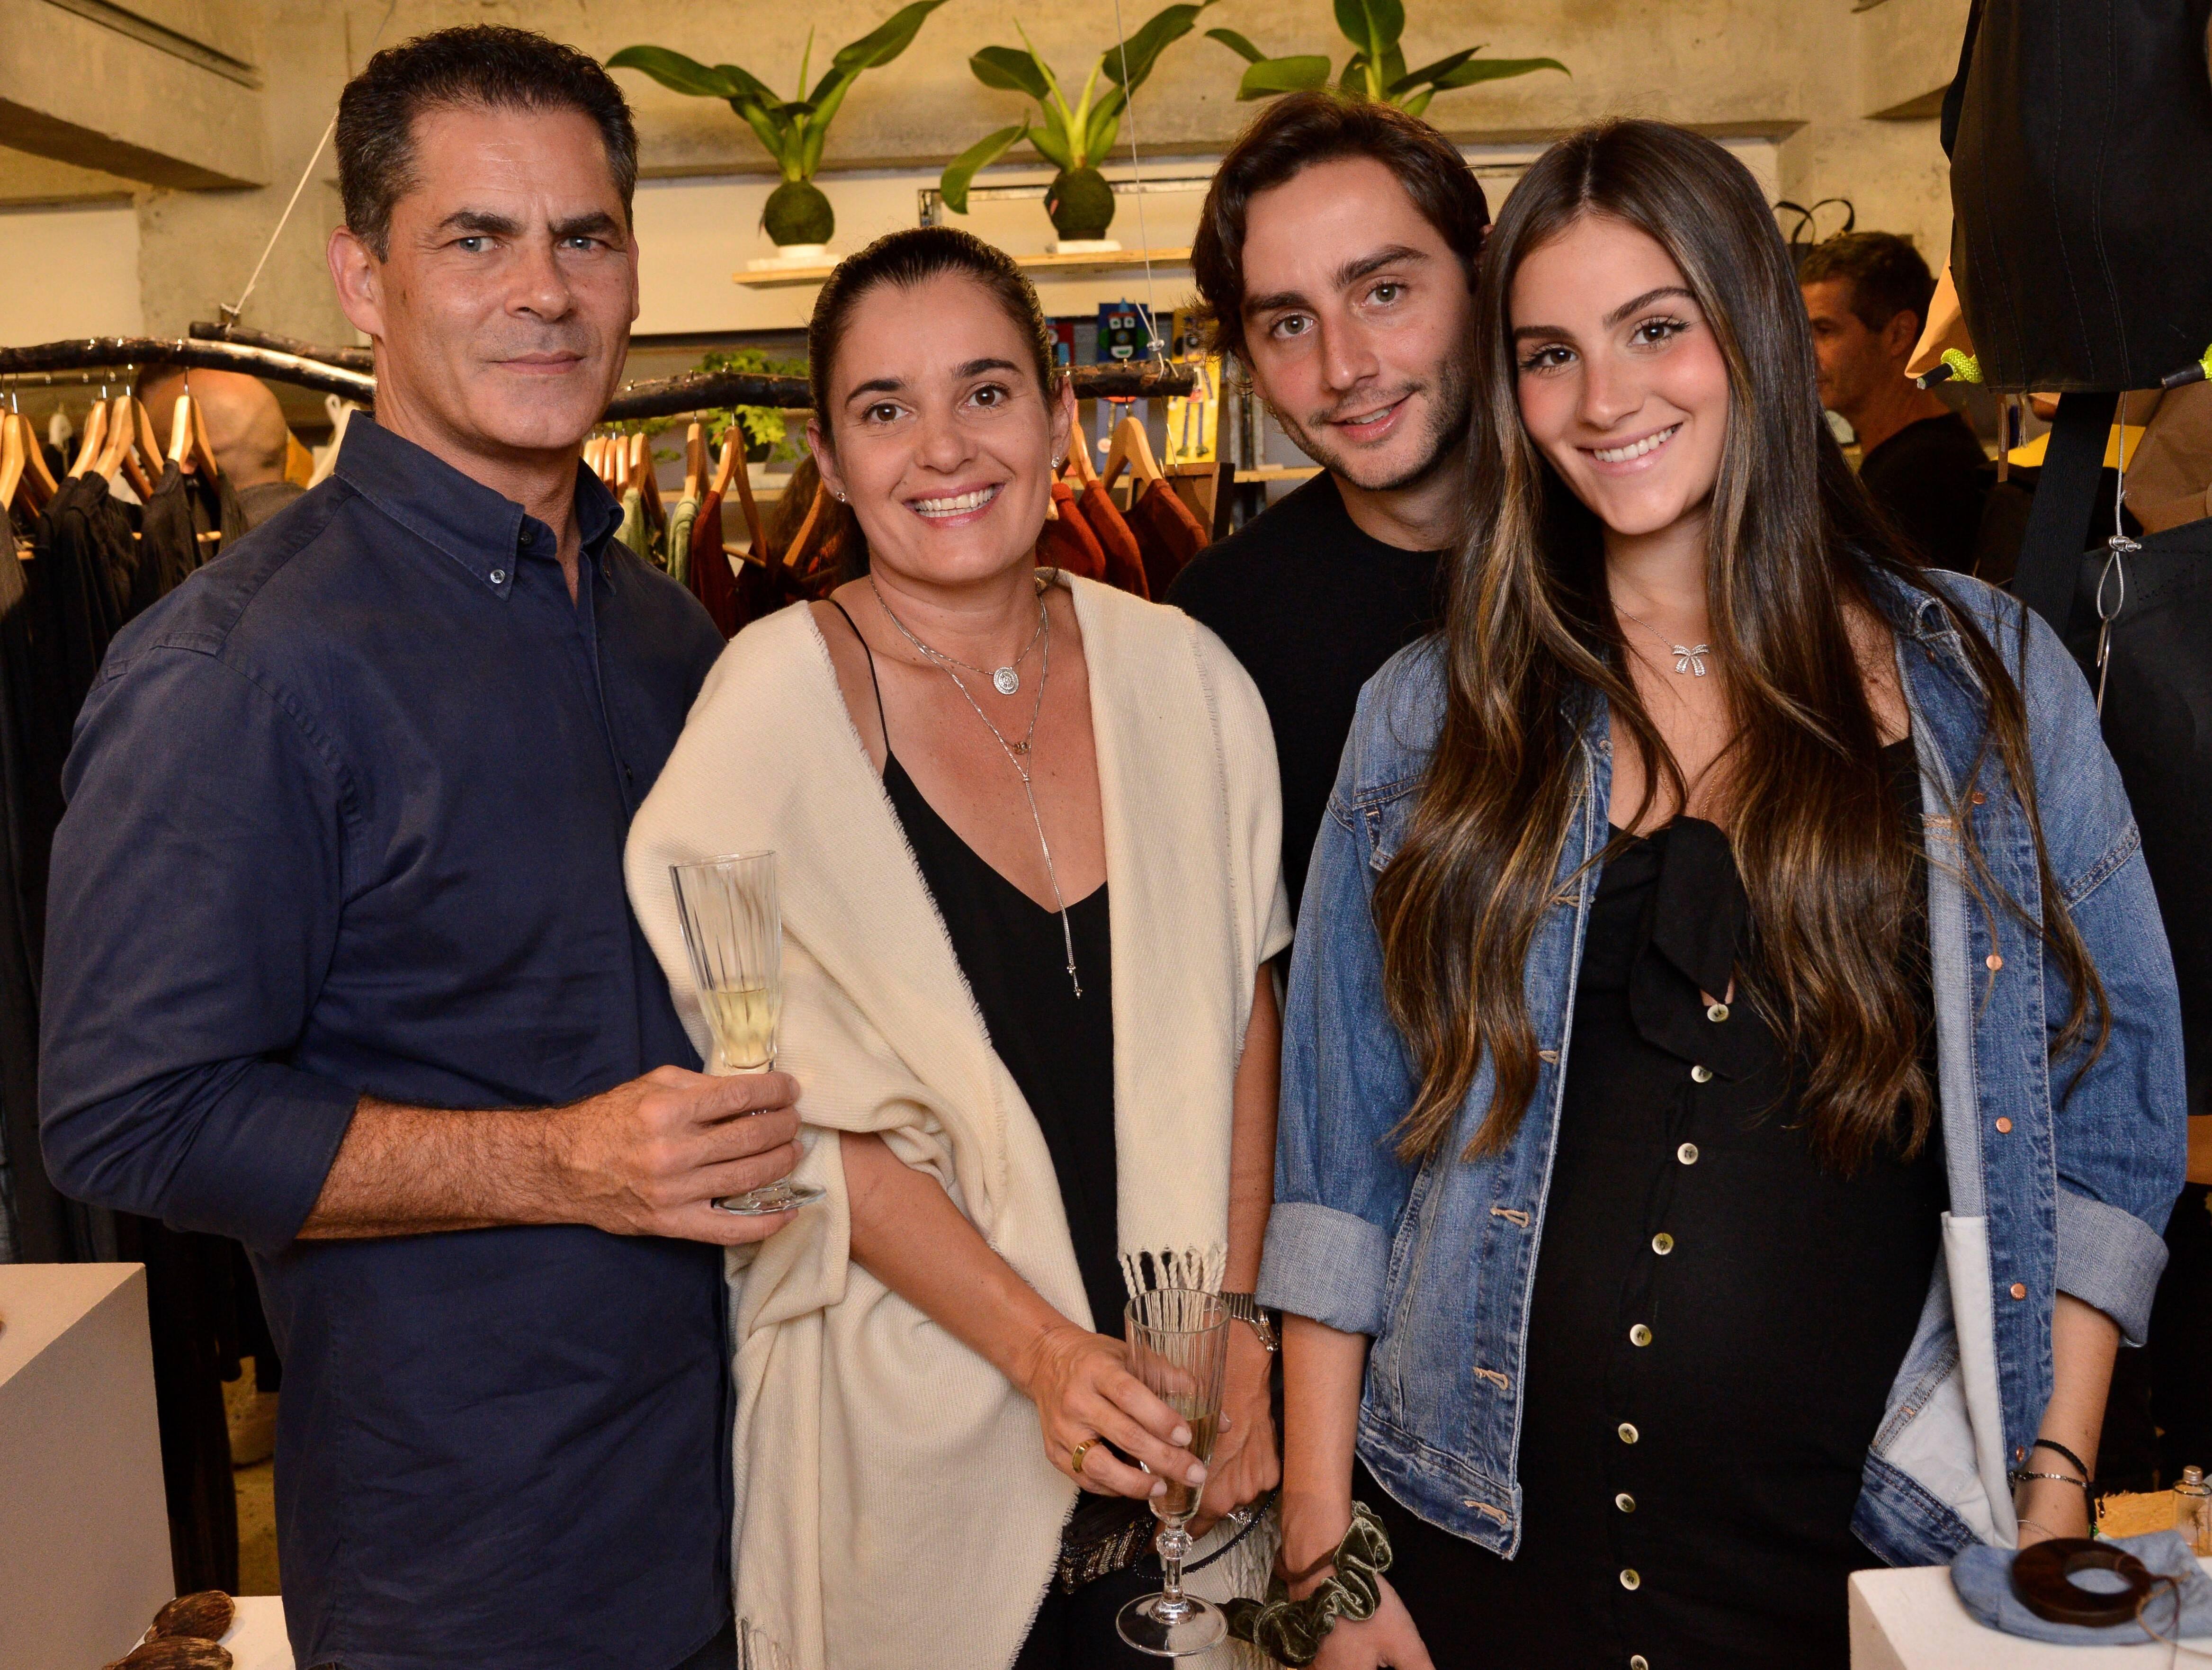 Luis Figueiredo, Ana Luiza Figueiredo, Davi e Larissa Cerqueira  /Foto: João Sal